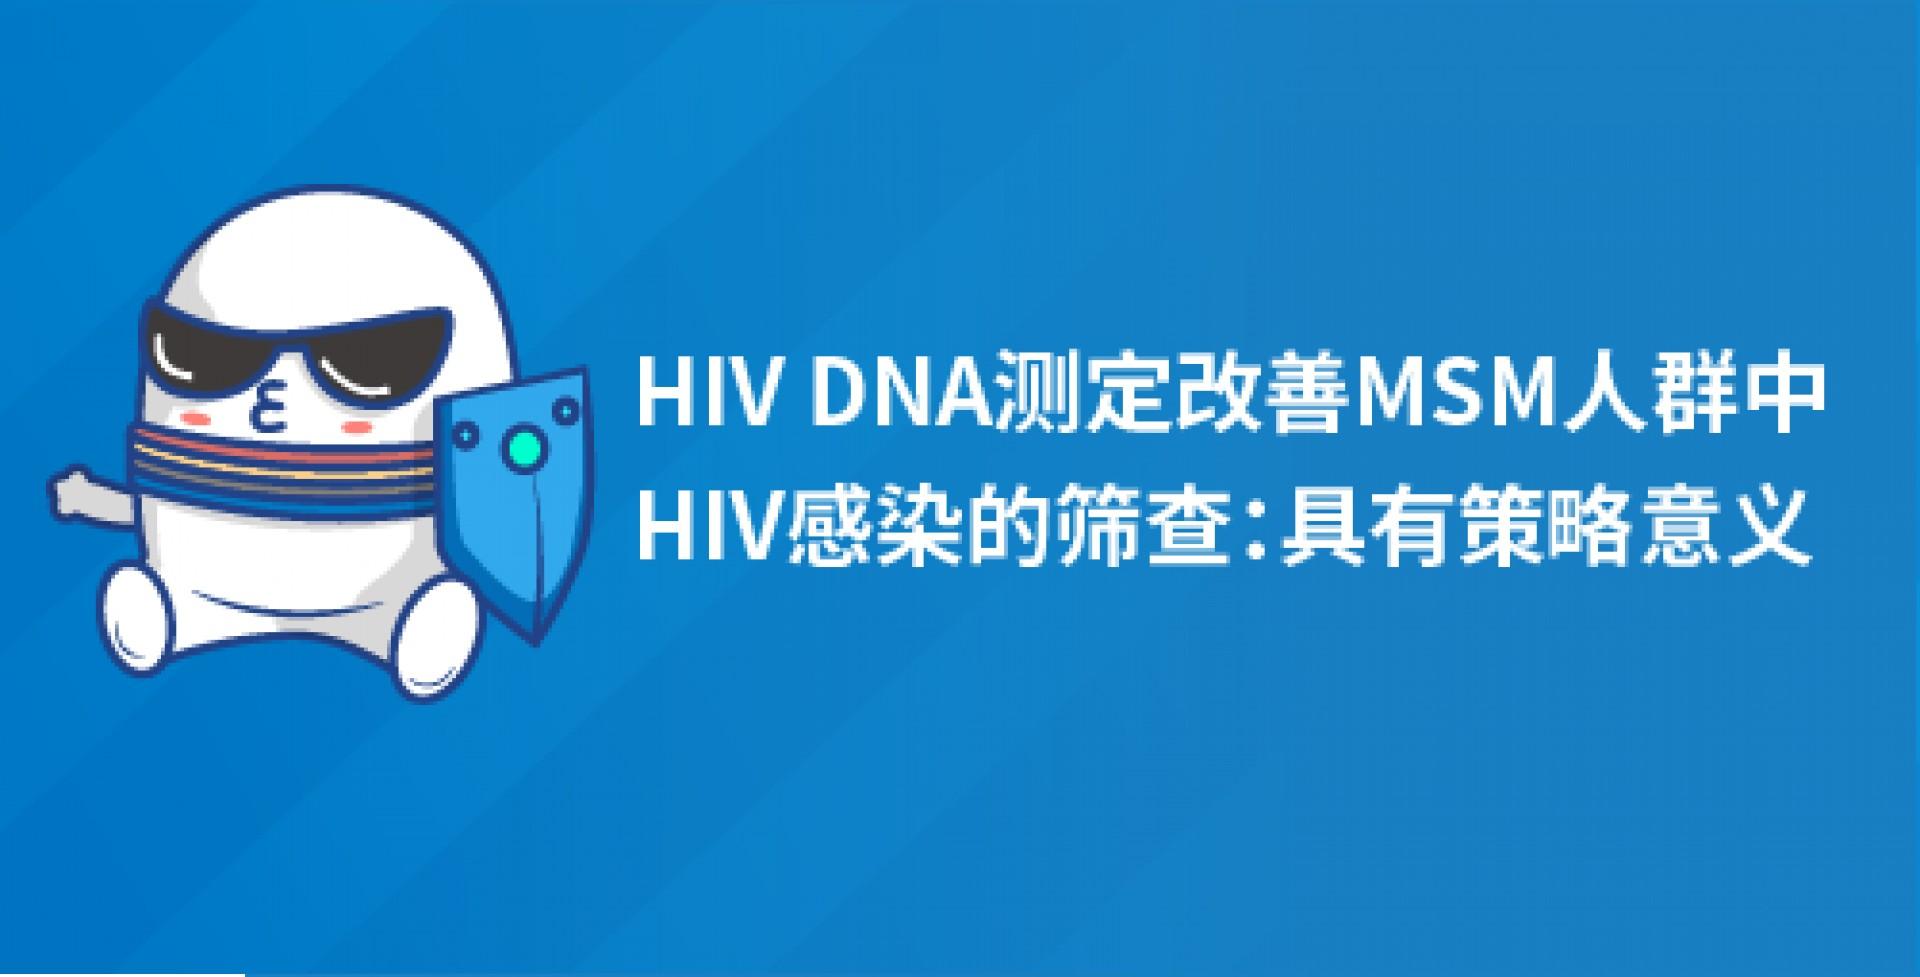 HIV DNA测定改善MSM人群中HIV感染的筛查:具有策略意义